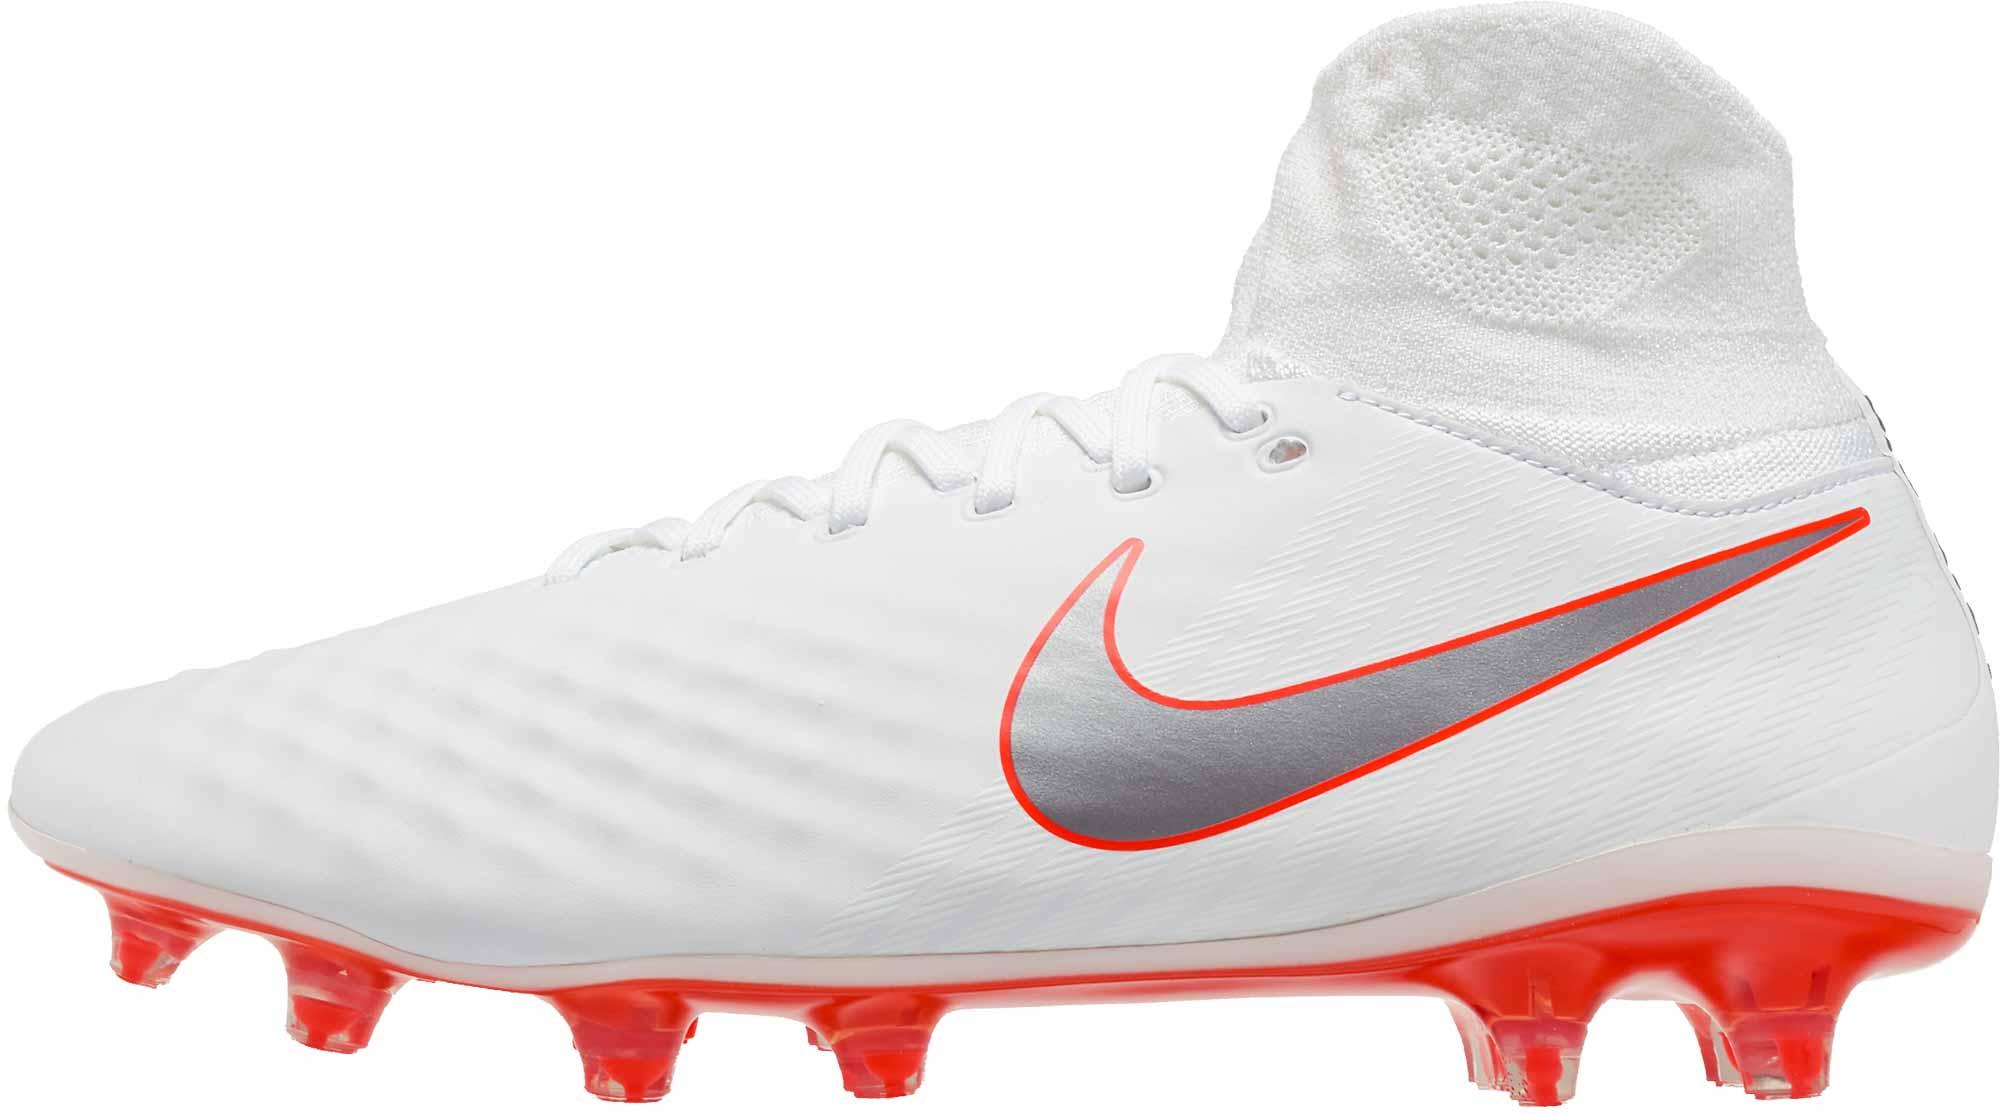 515bf3e4a Nike Magista Obra II Pro DF FG - White Metallic Cool Grey - SoccerPro